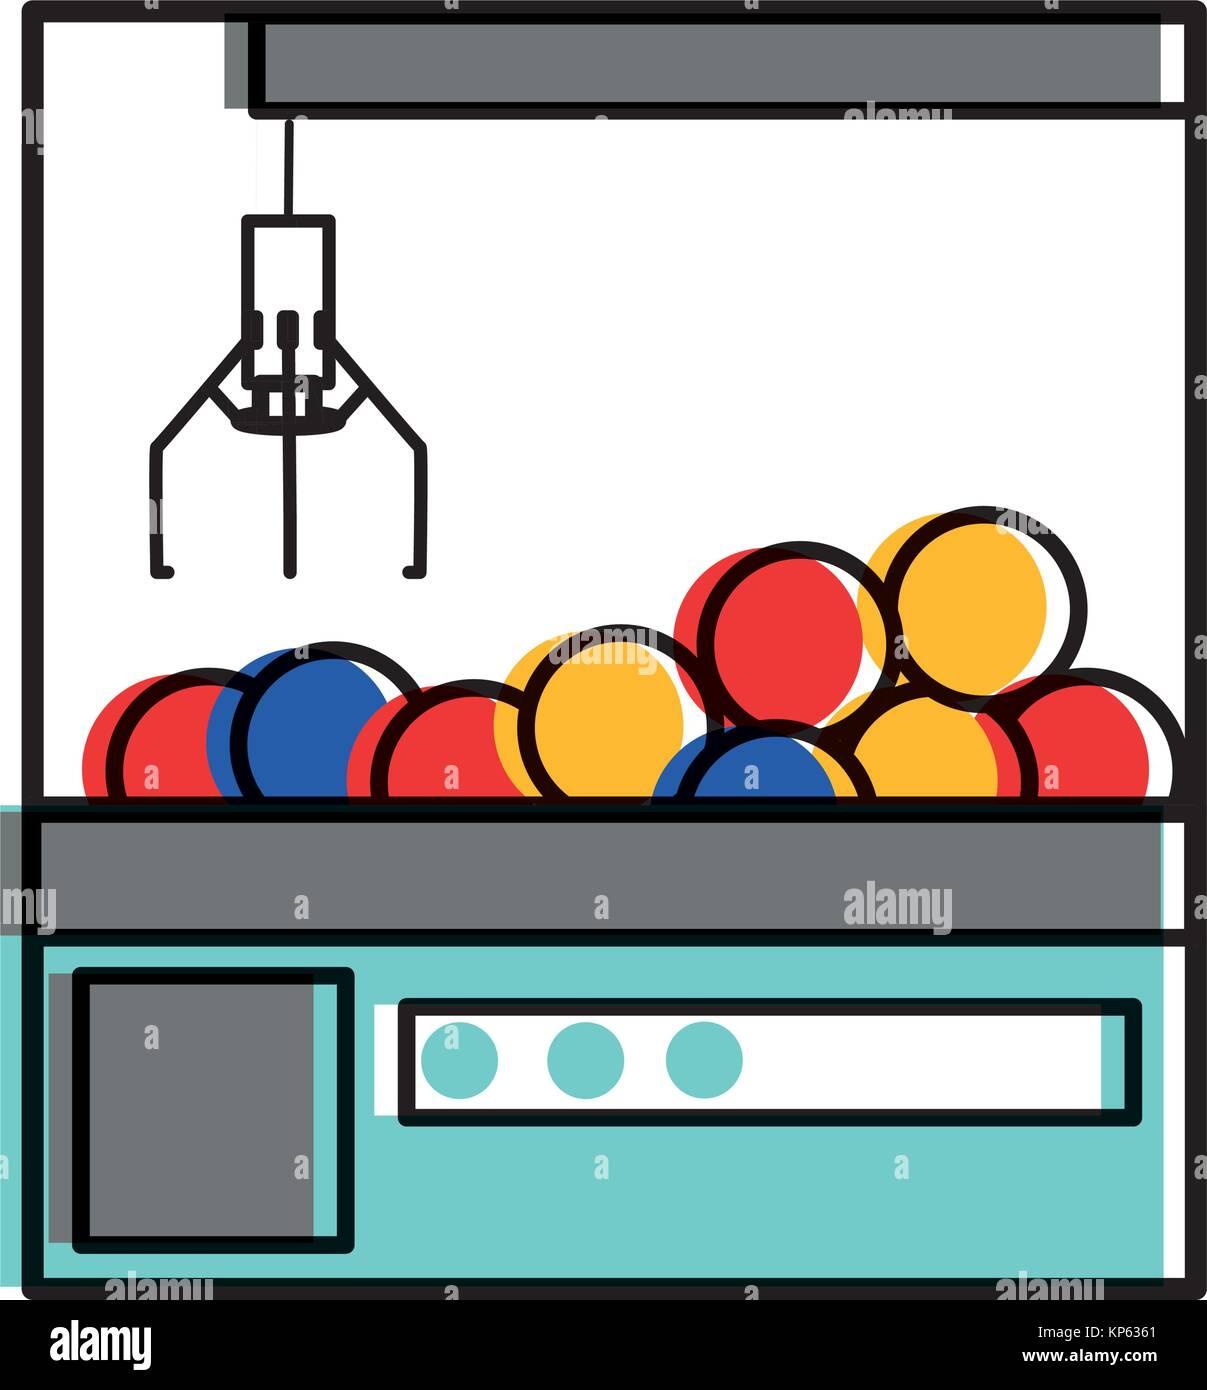 Claw machine design - Stock Image